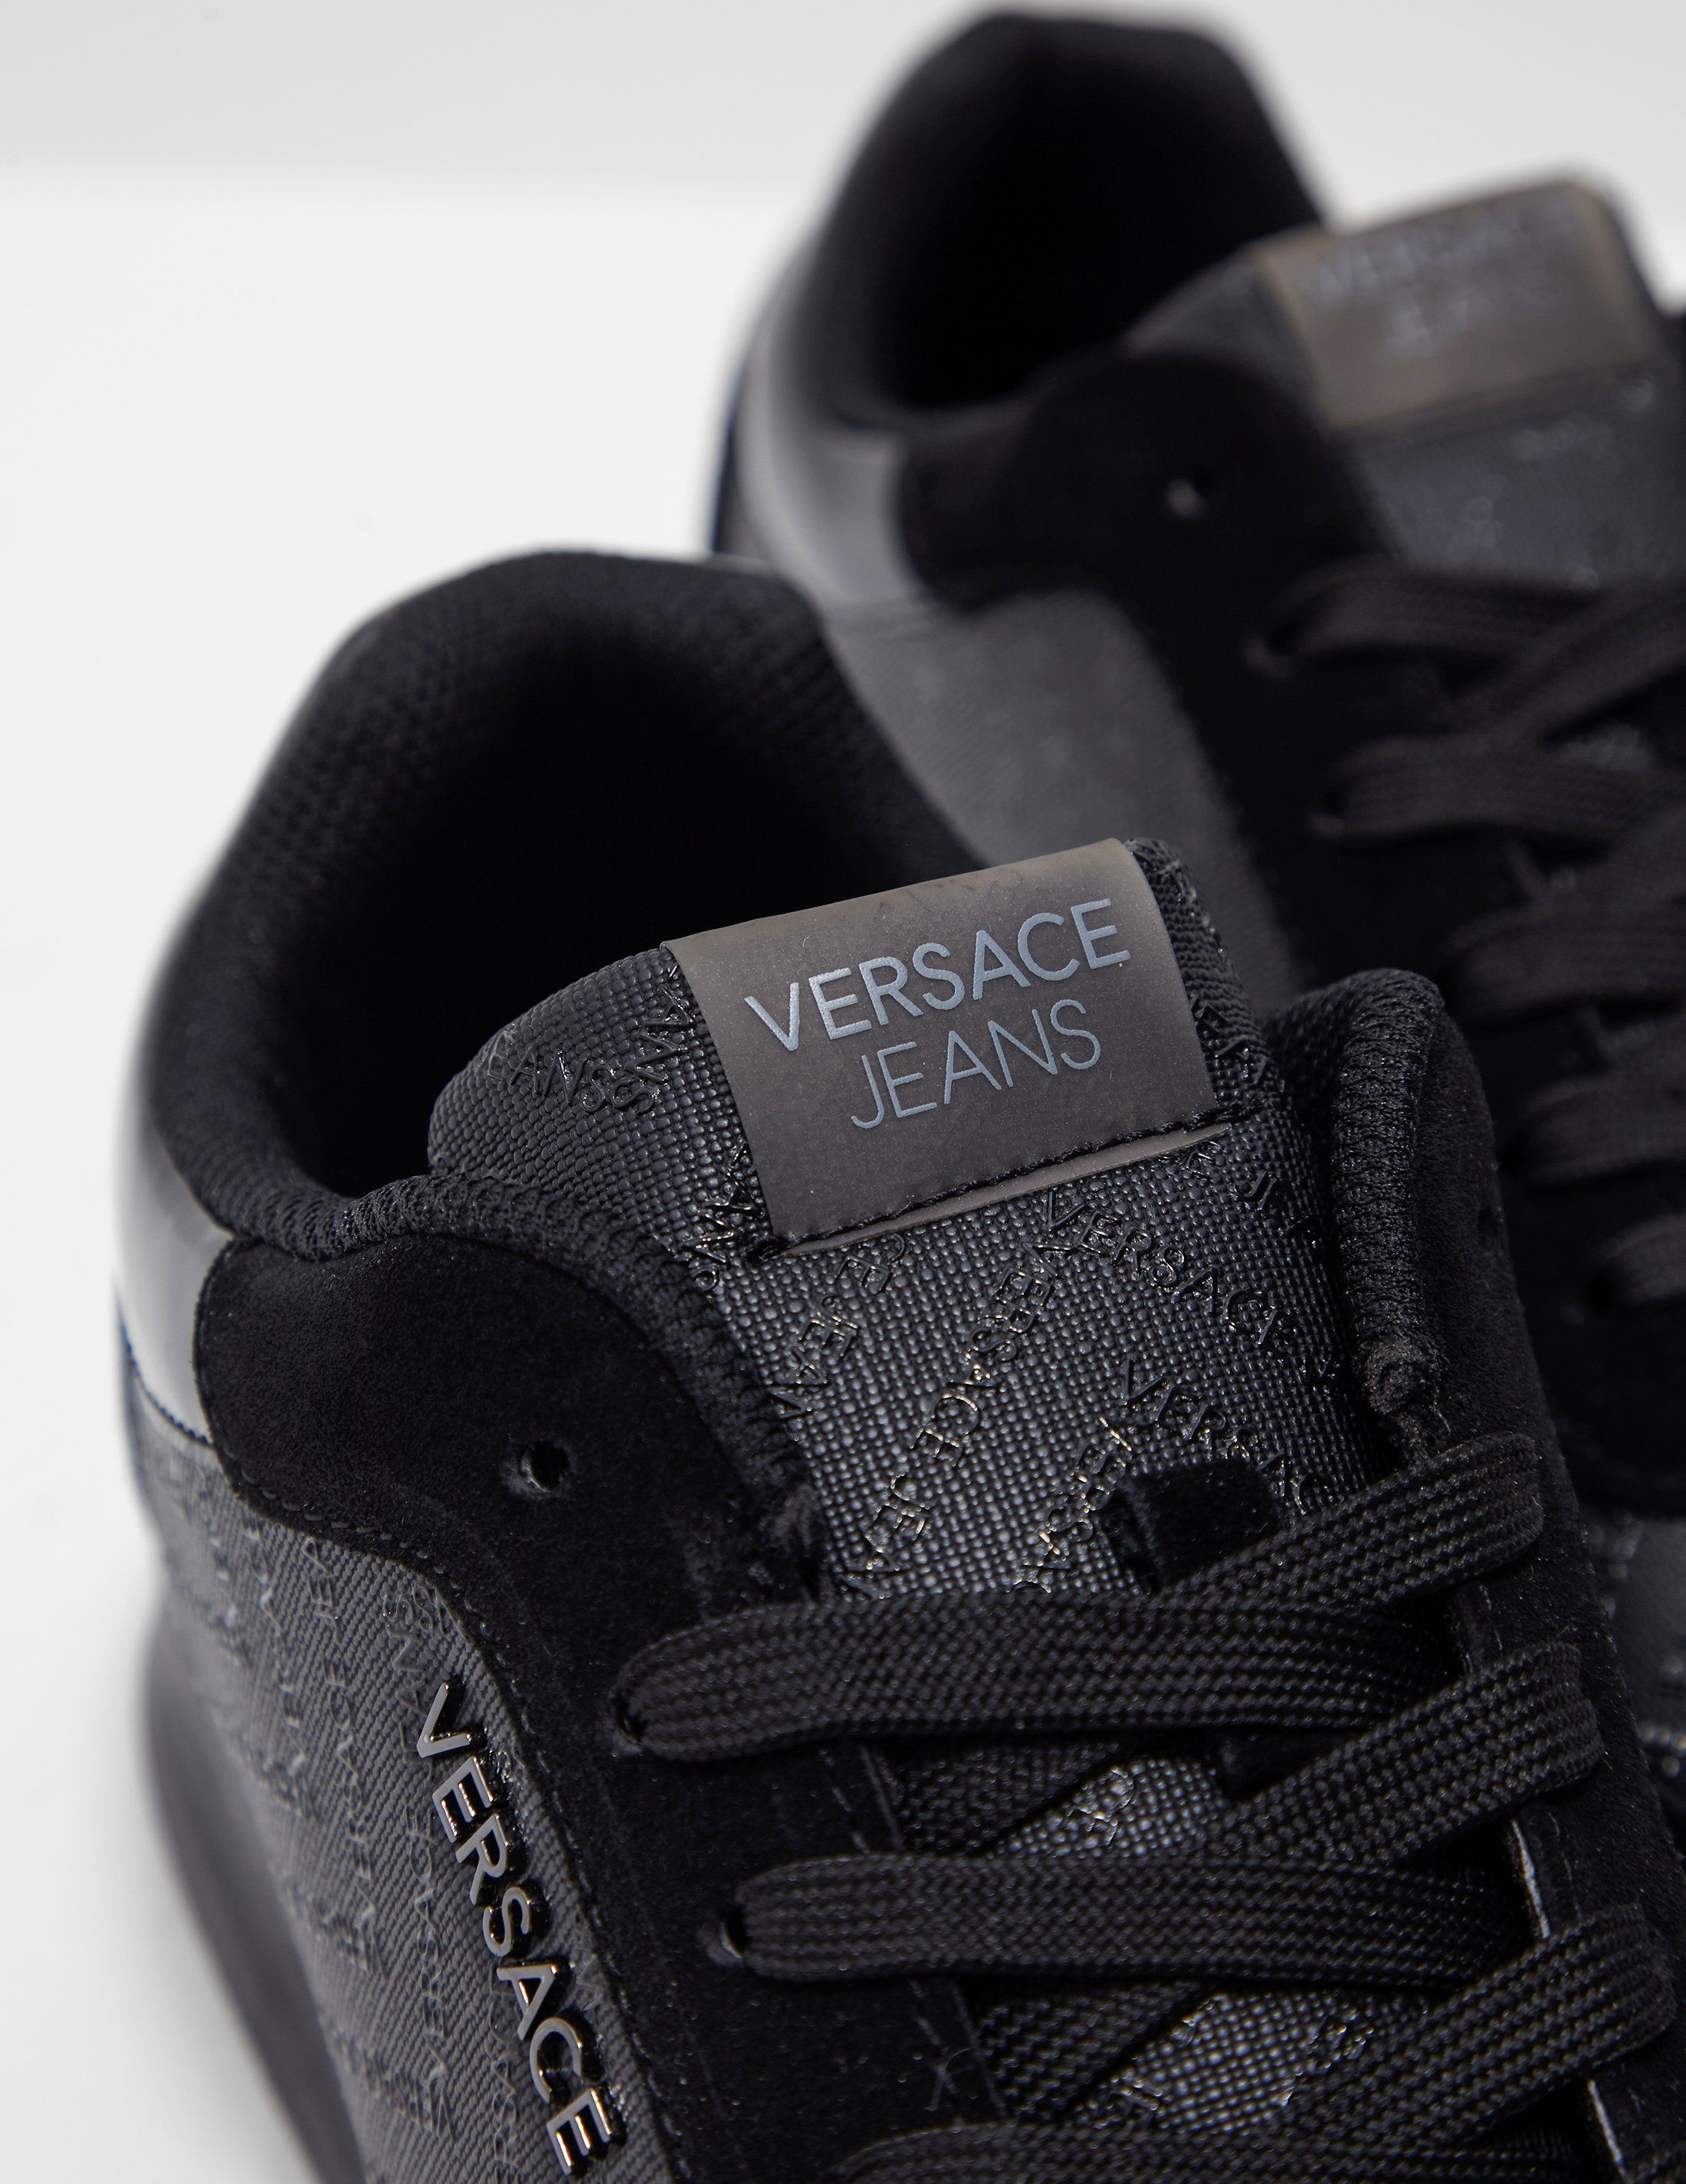 Versace Jeans Chevron Logo Print Trainers